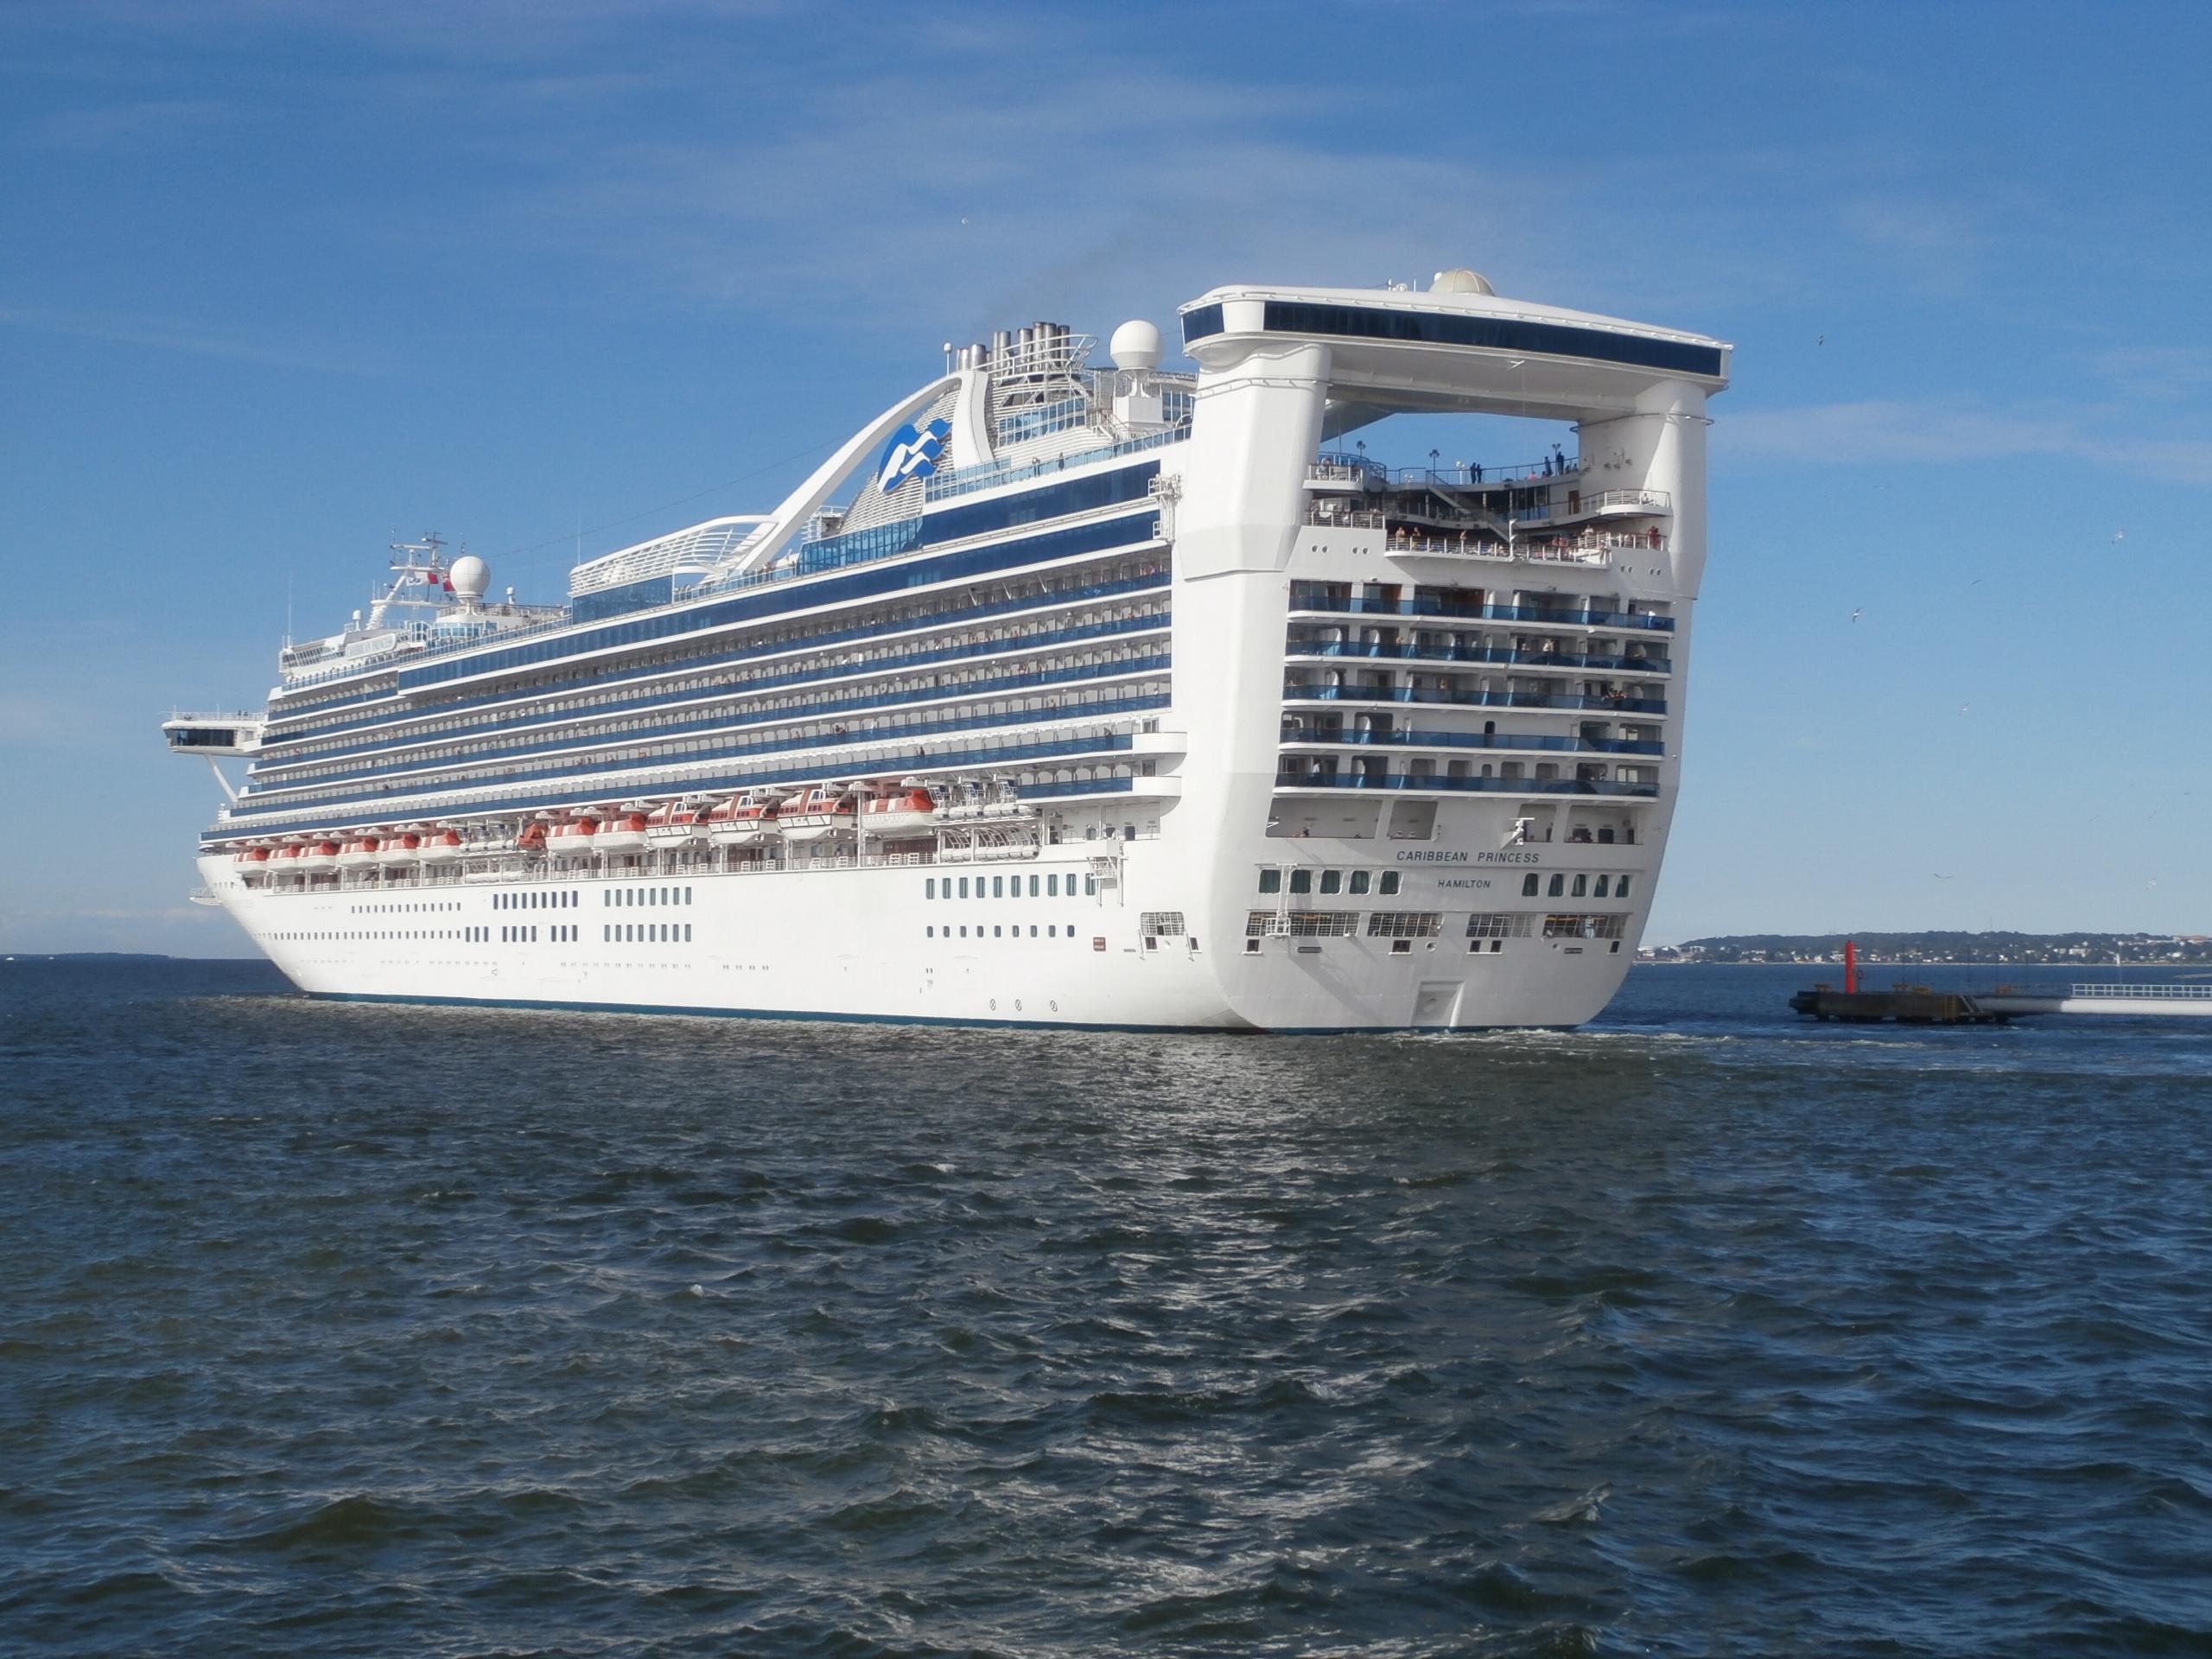 FileCaribbean Princess departing Tallinn 10 August 2015JPG